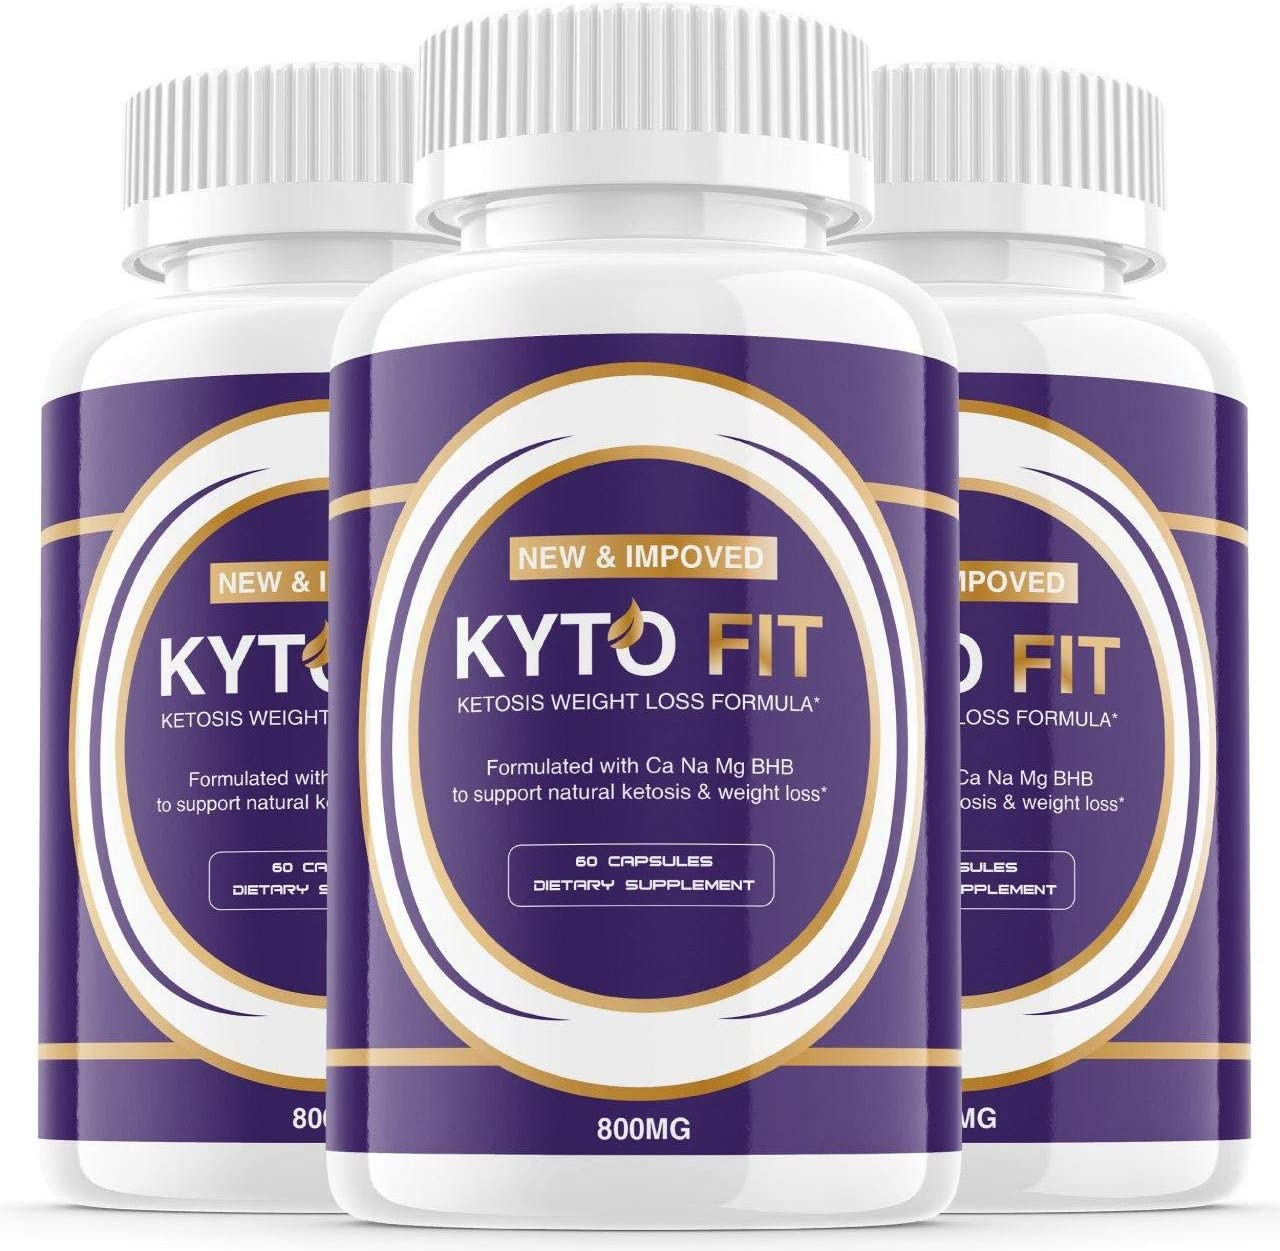 (3 Pack) Kyto Fit Pills 800mg, Kyto Fit Diet Pills Capsules BHB Supplement, Complete Ketogenic Diet for Beginners, BHB Ketones Slim Pills for Energy, Focus for Men Women (180 Capsules)